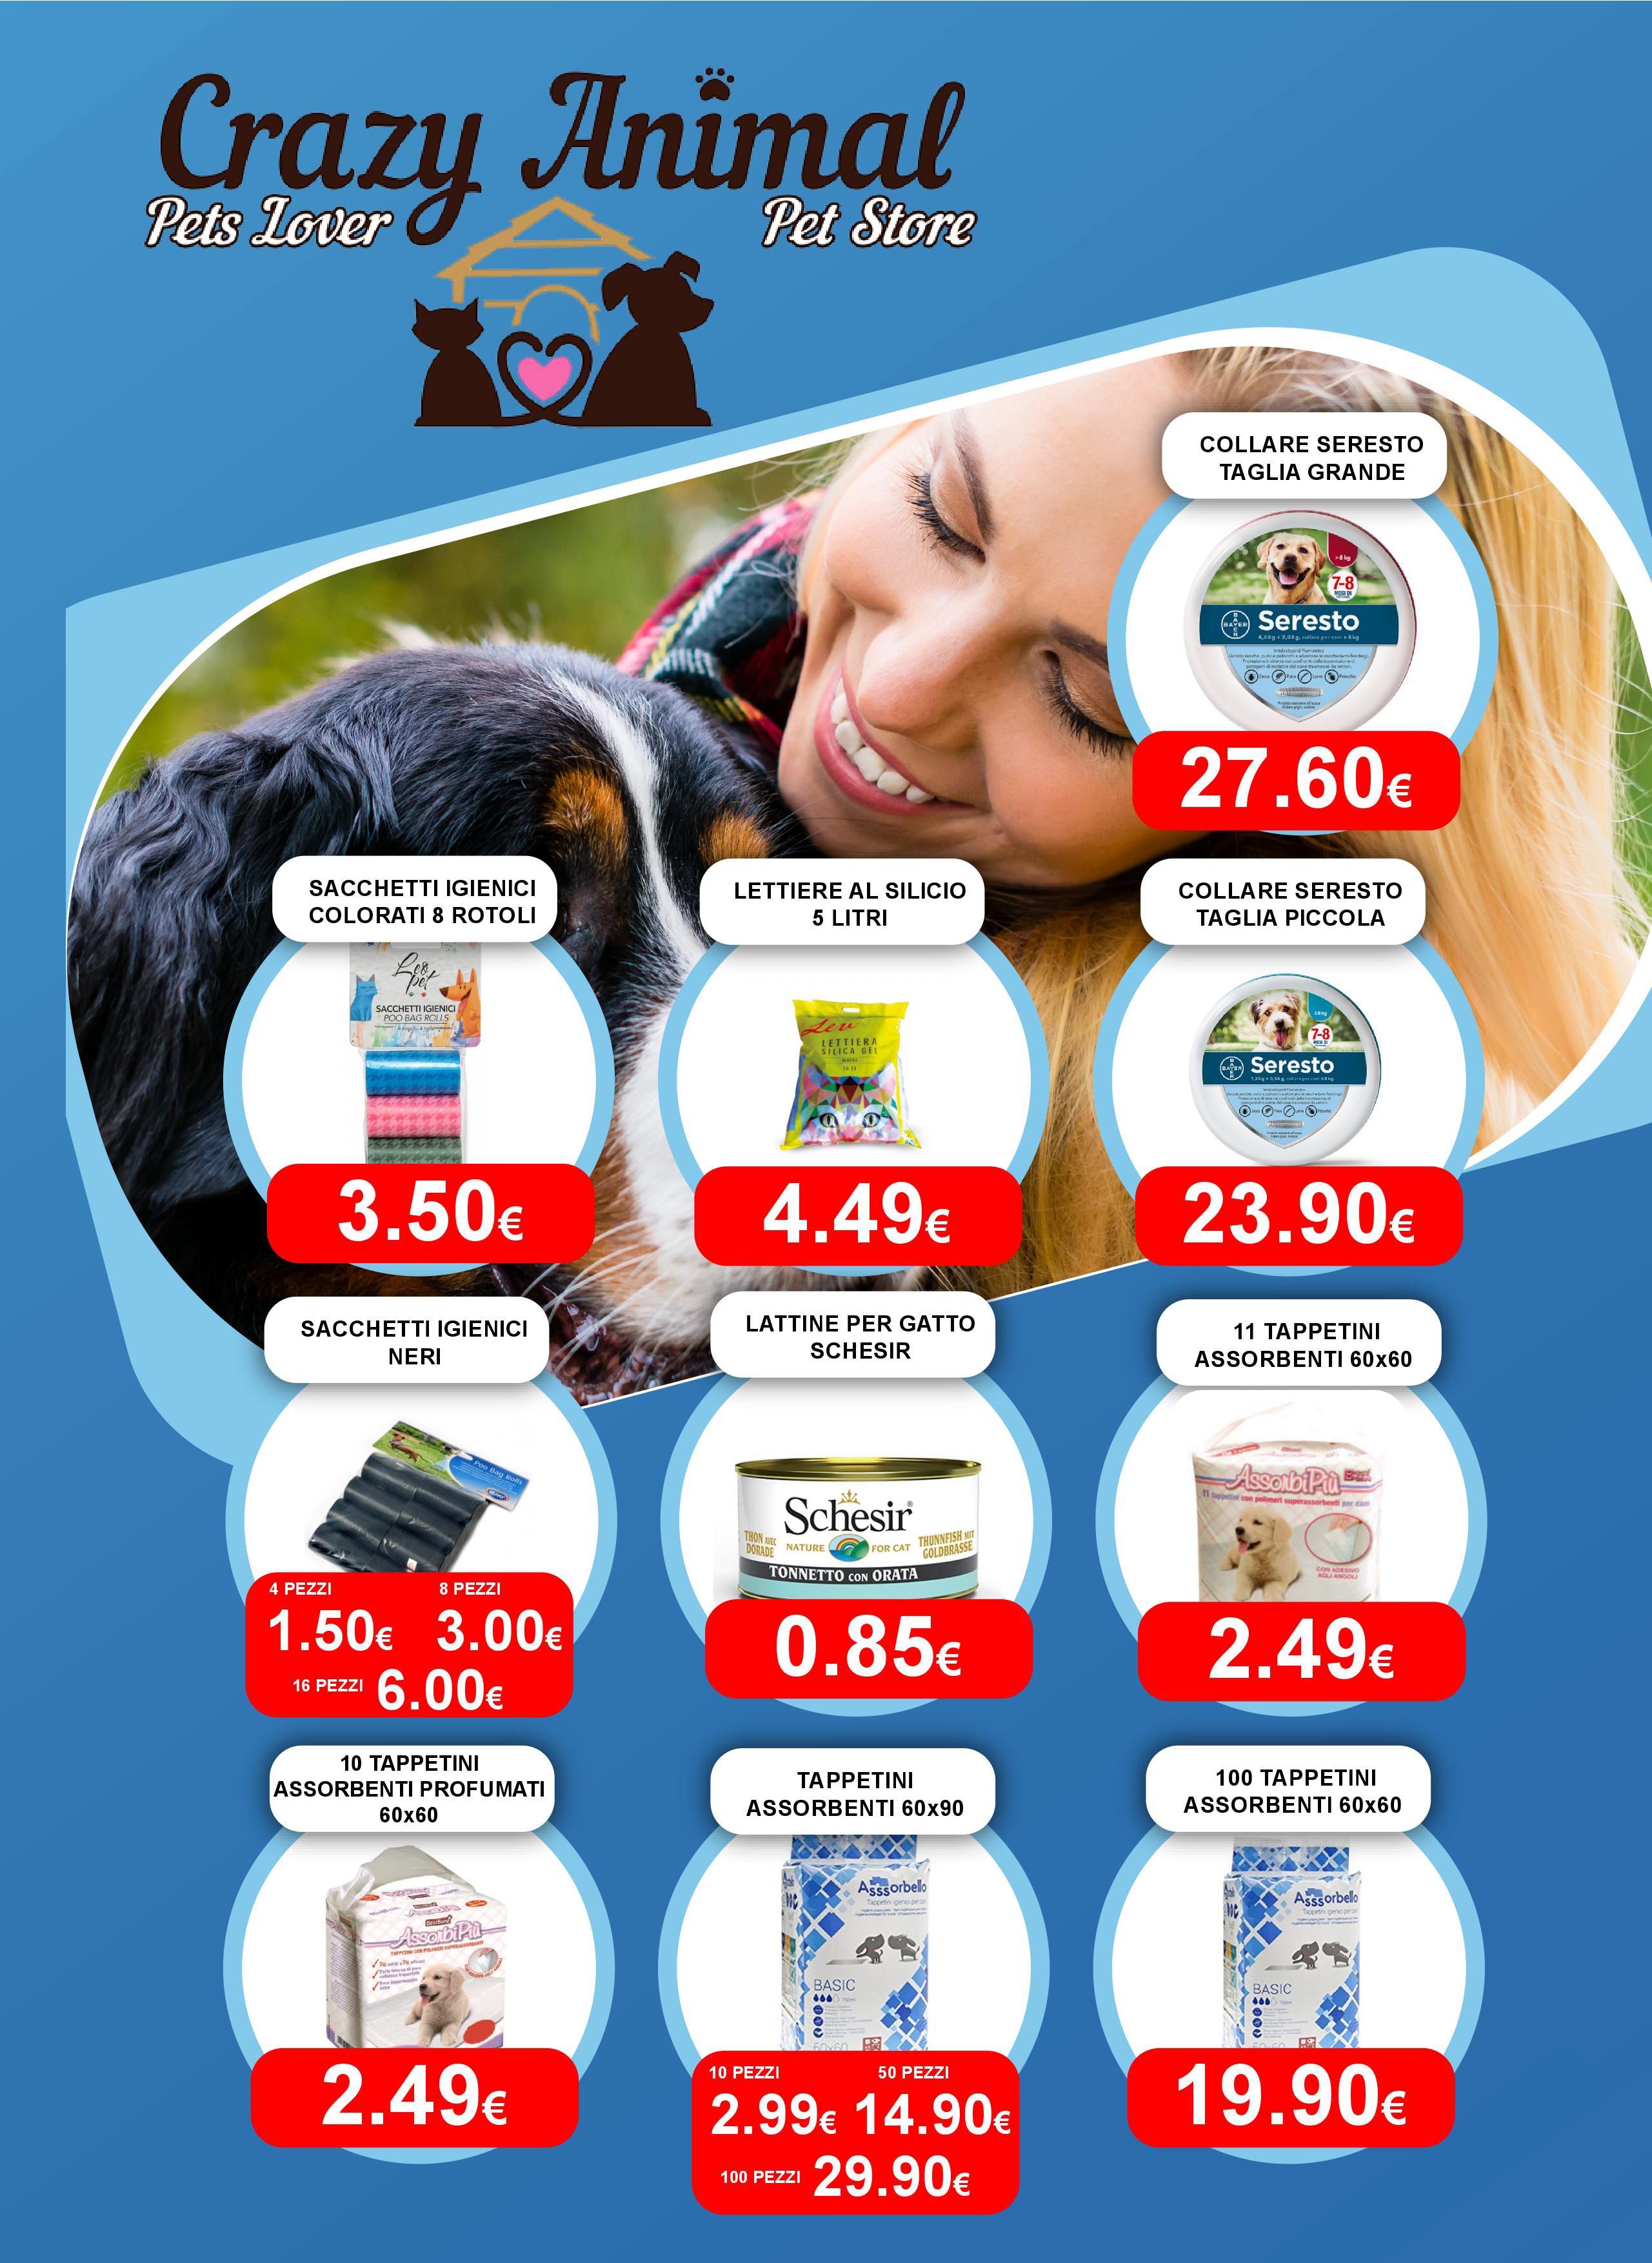 volantino crazy animal pet shop pagina 1